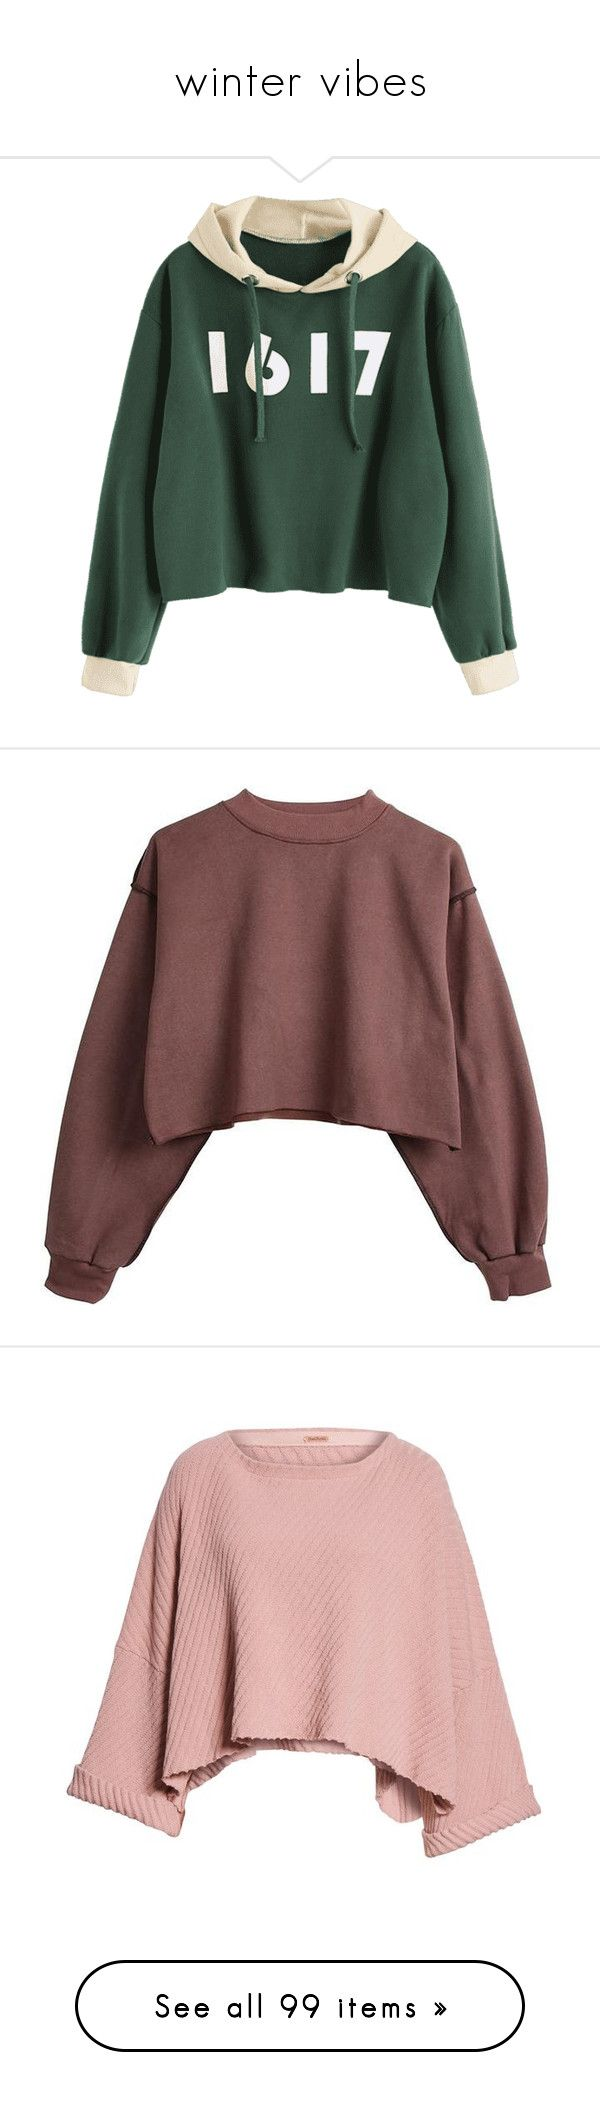 """winter vibes"" by beingmyselfaf ❤ liked on Polyvore featuring Winter, tops, hoodies, sweaters, zaful, coats, green hoodies, colourblock hoodie, hooded sweatshirt and color block hoodies"